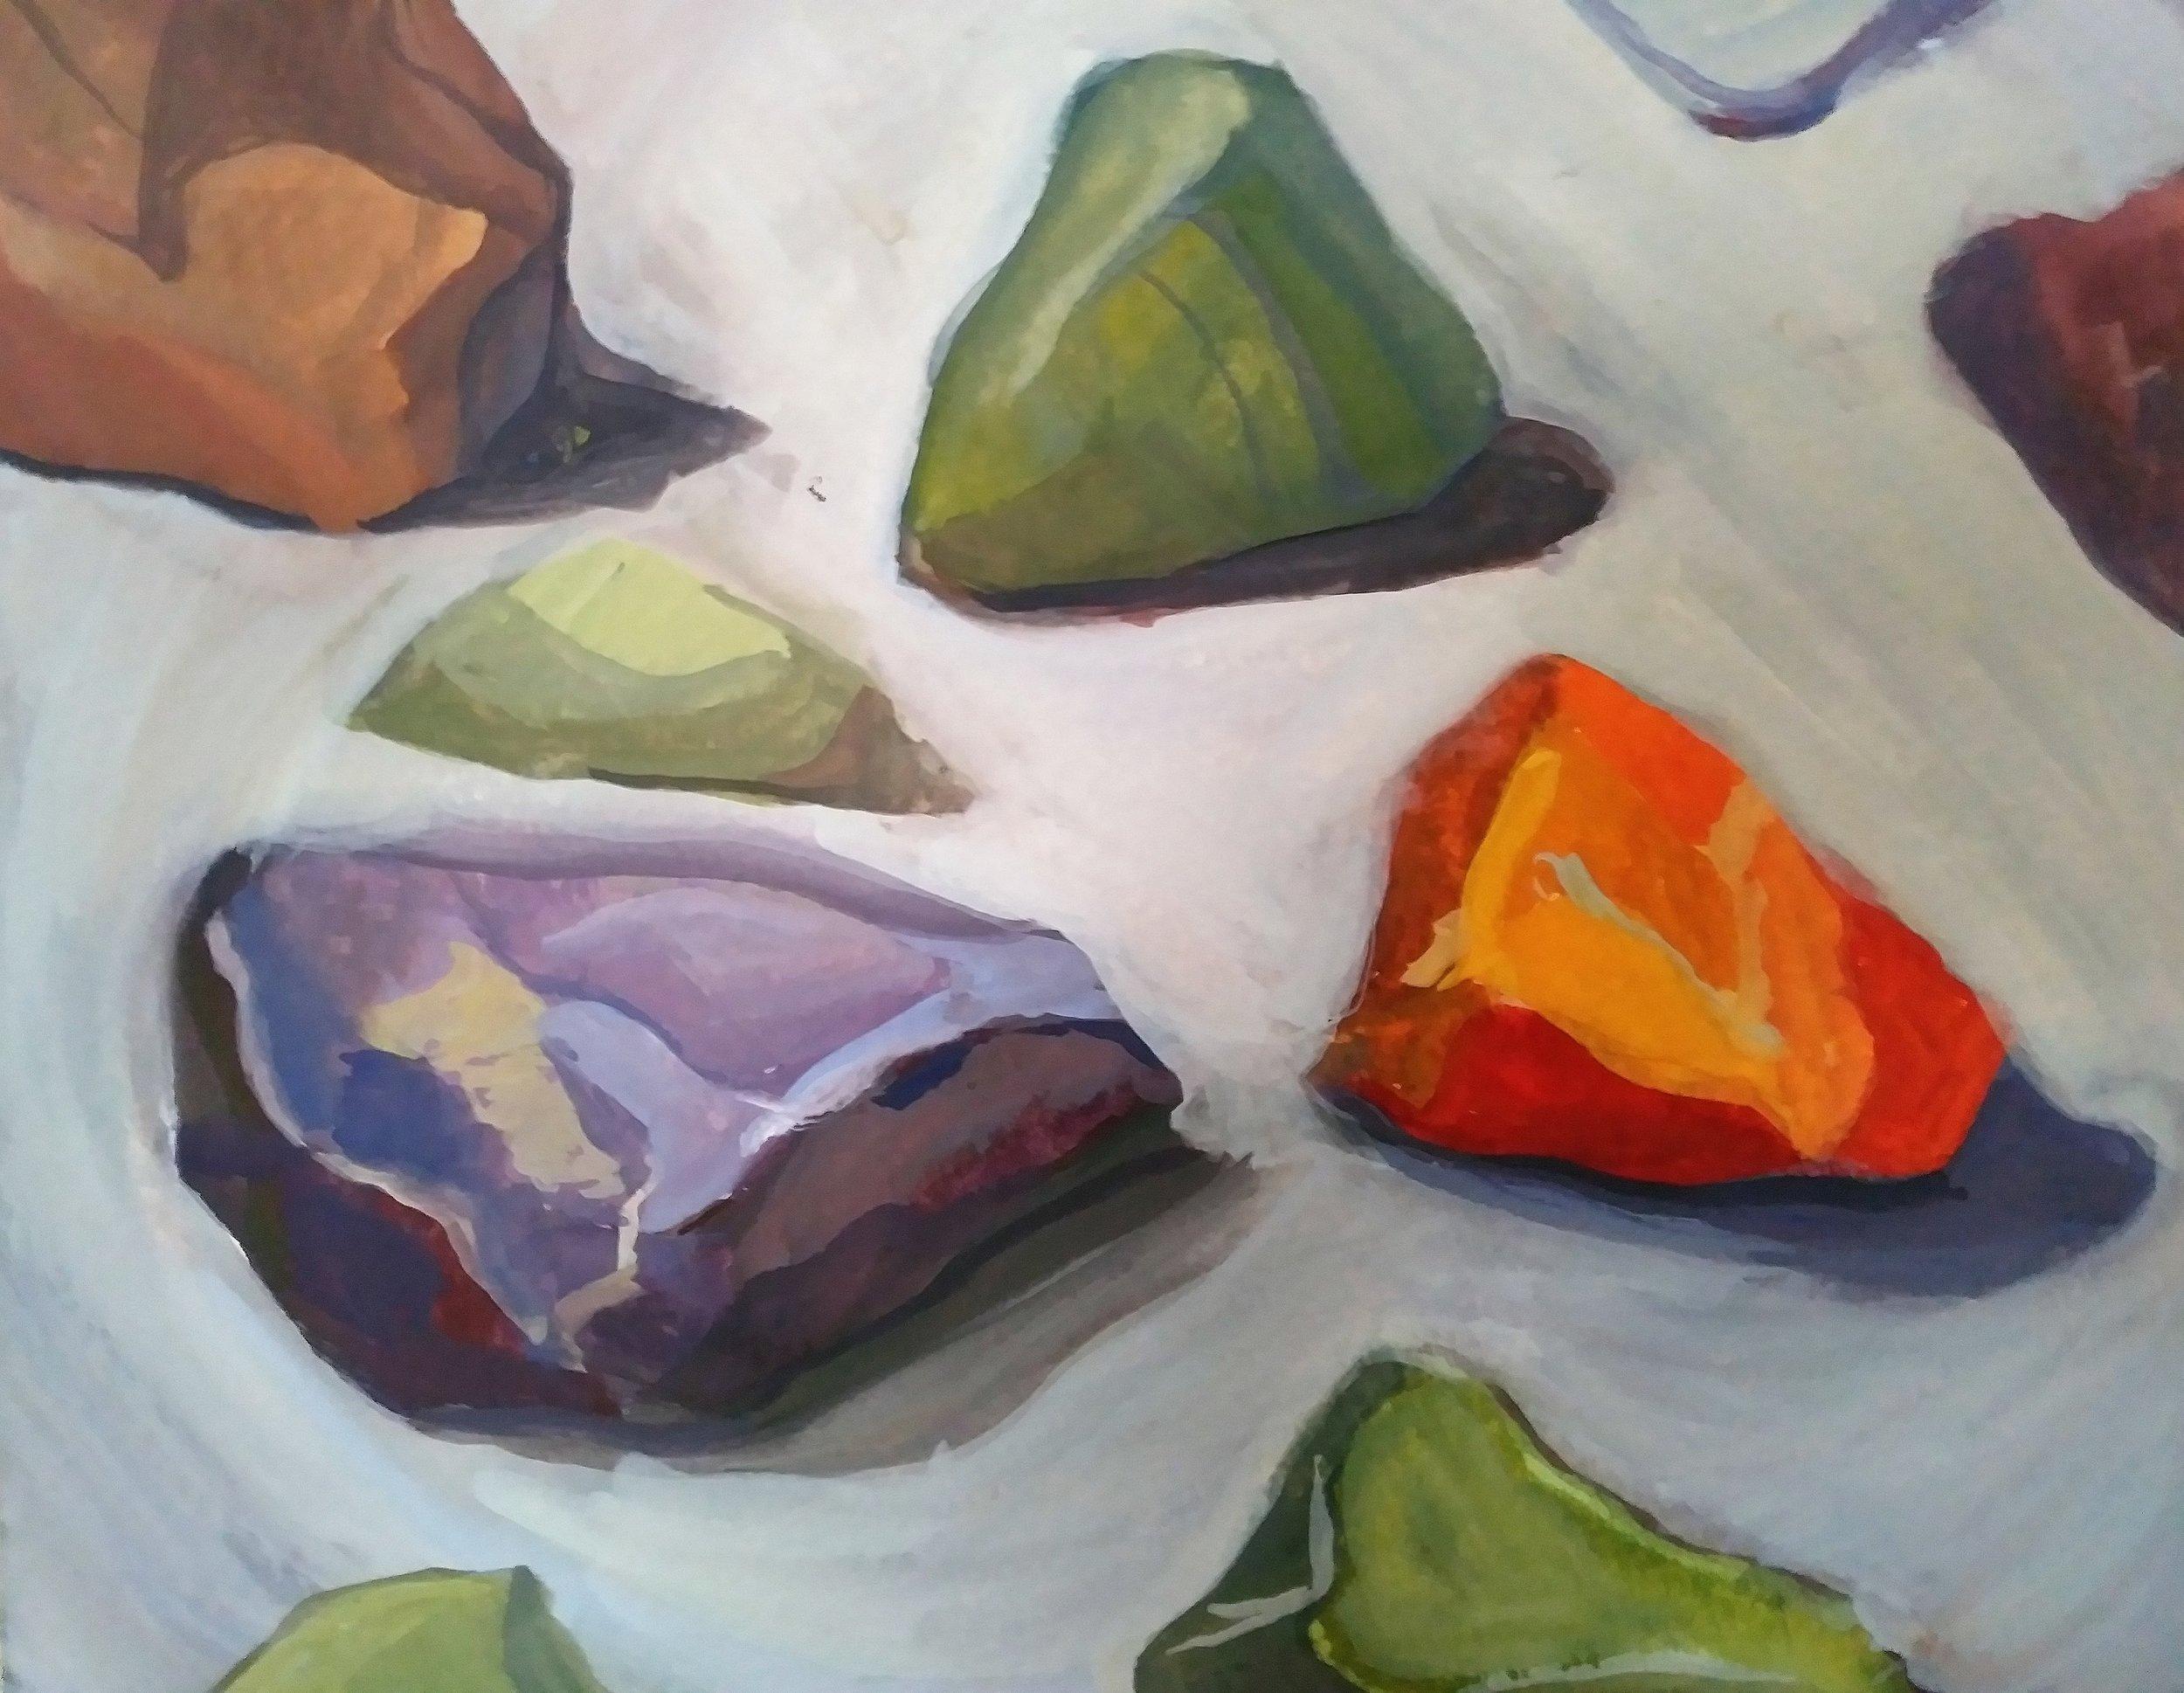 A Few Good Rocks